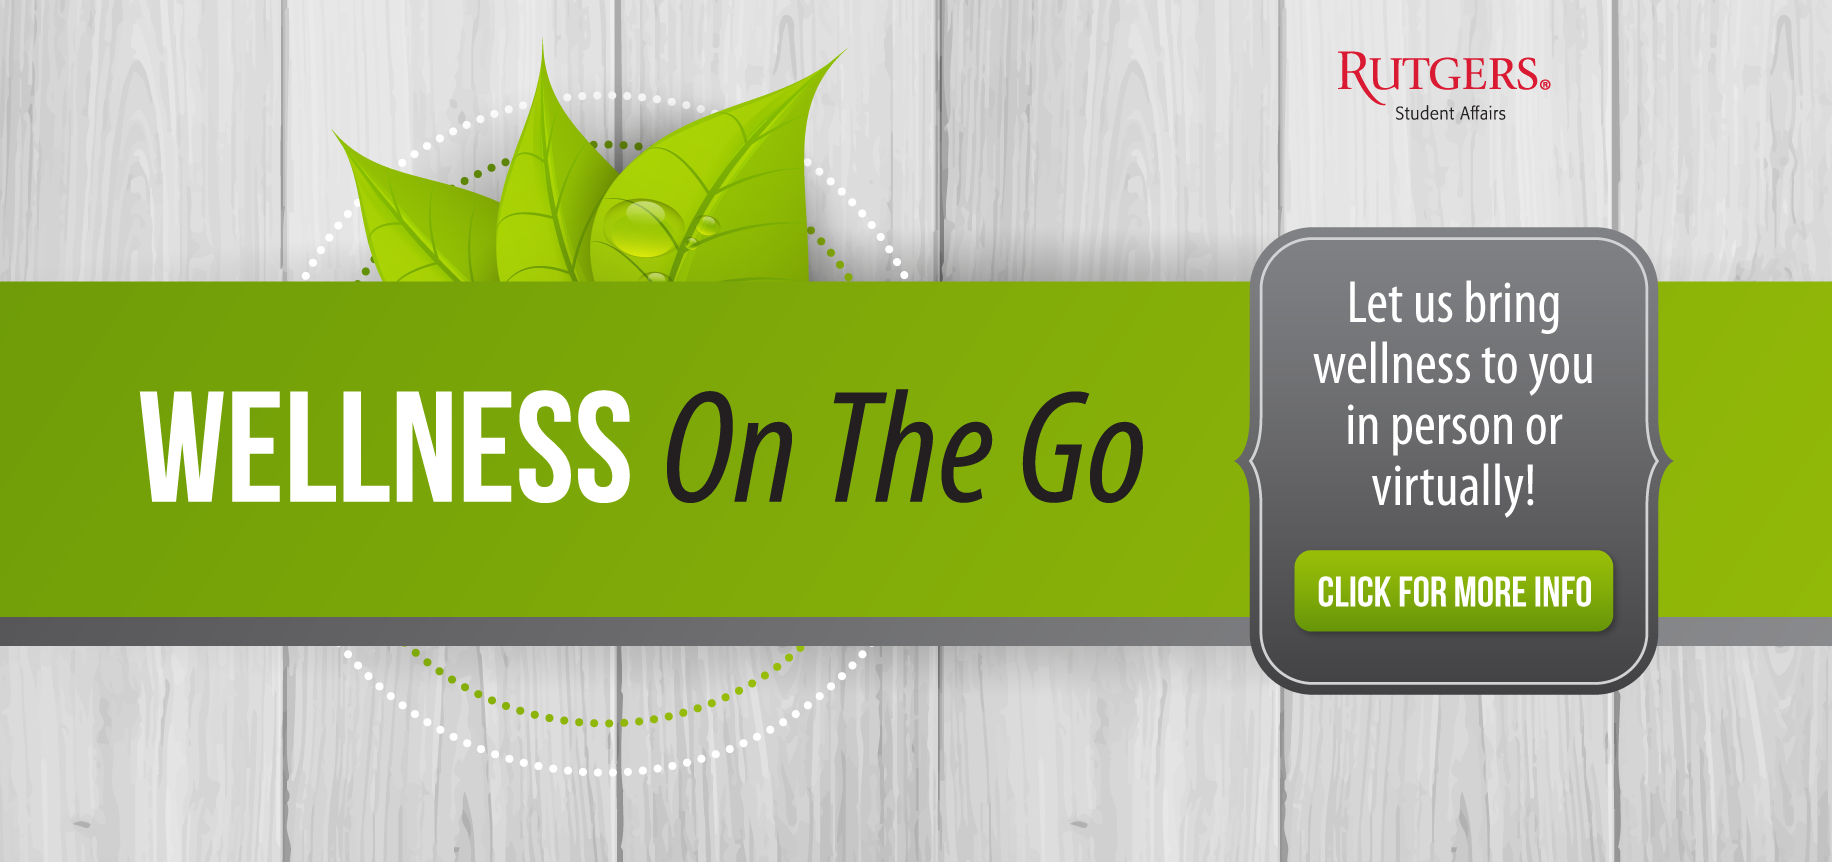 Rec_Wellness-On-The-Go-Menu_Web-Banner_F21